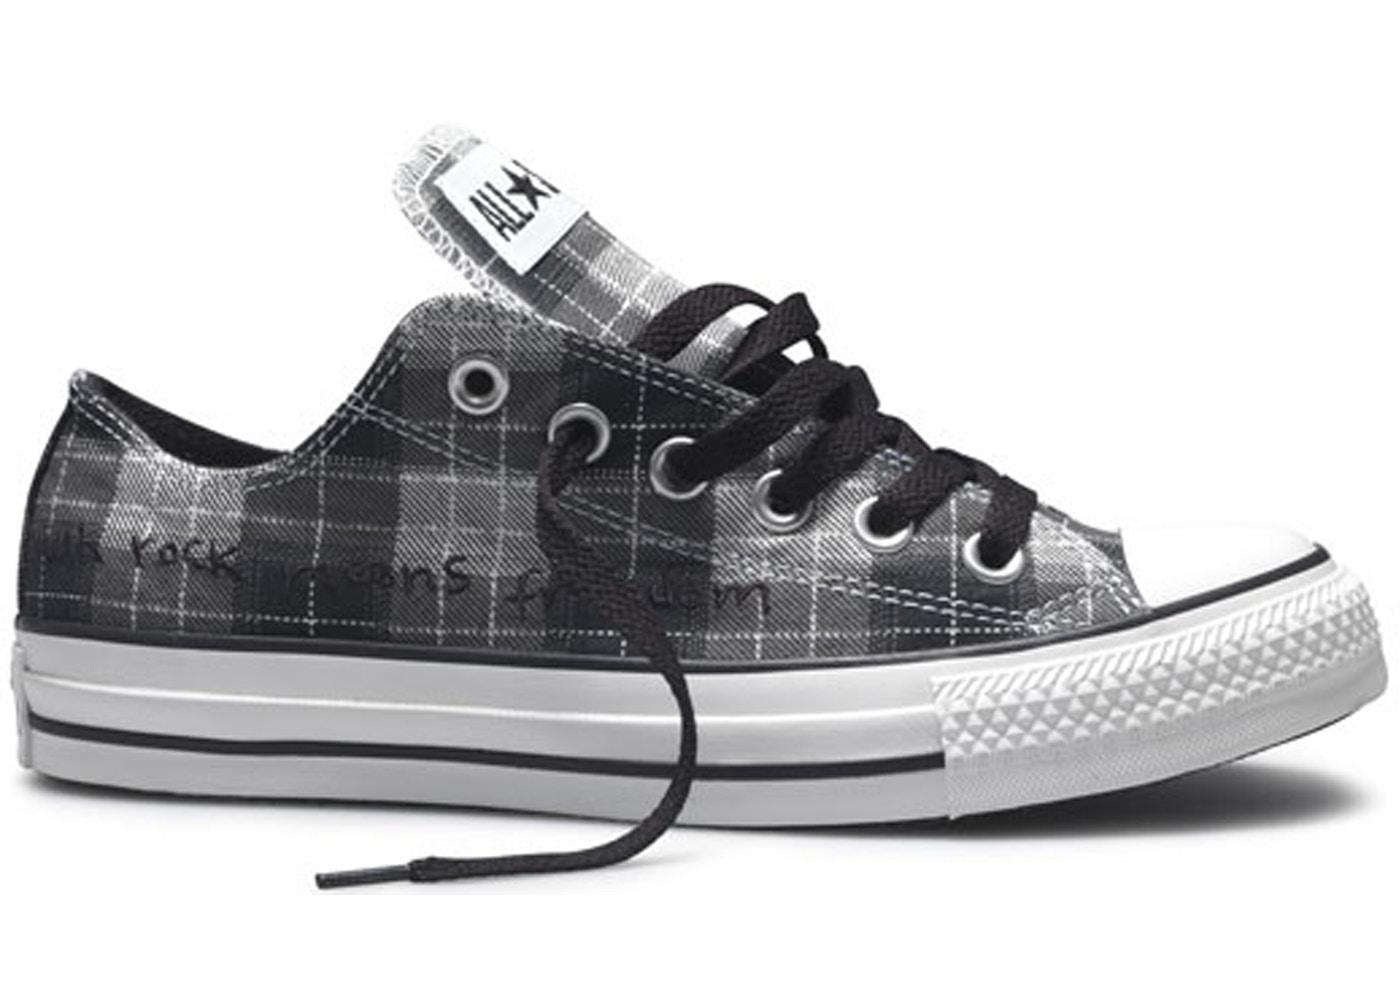 Converse Chuck Taylor All Star Ox Kurt Cobain (Plaid) Sneakers